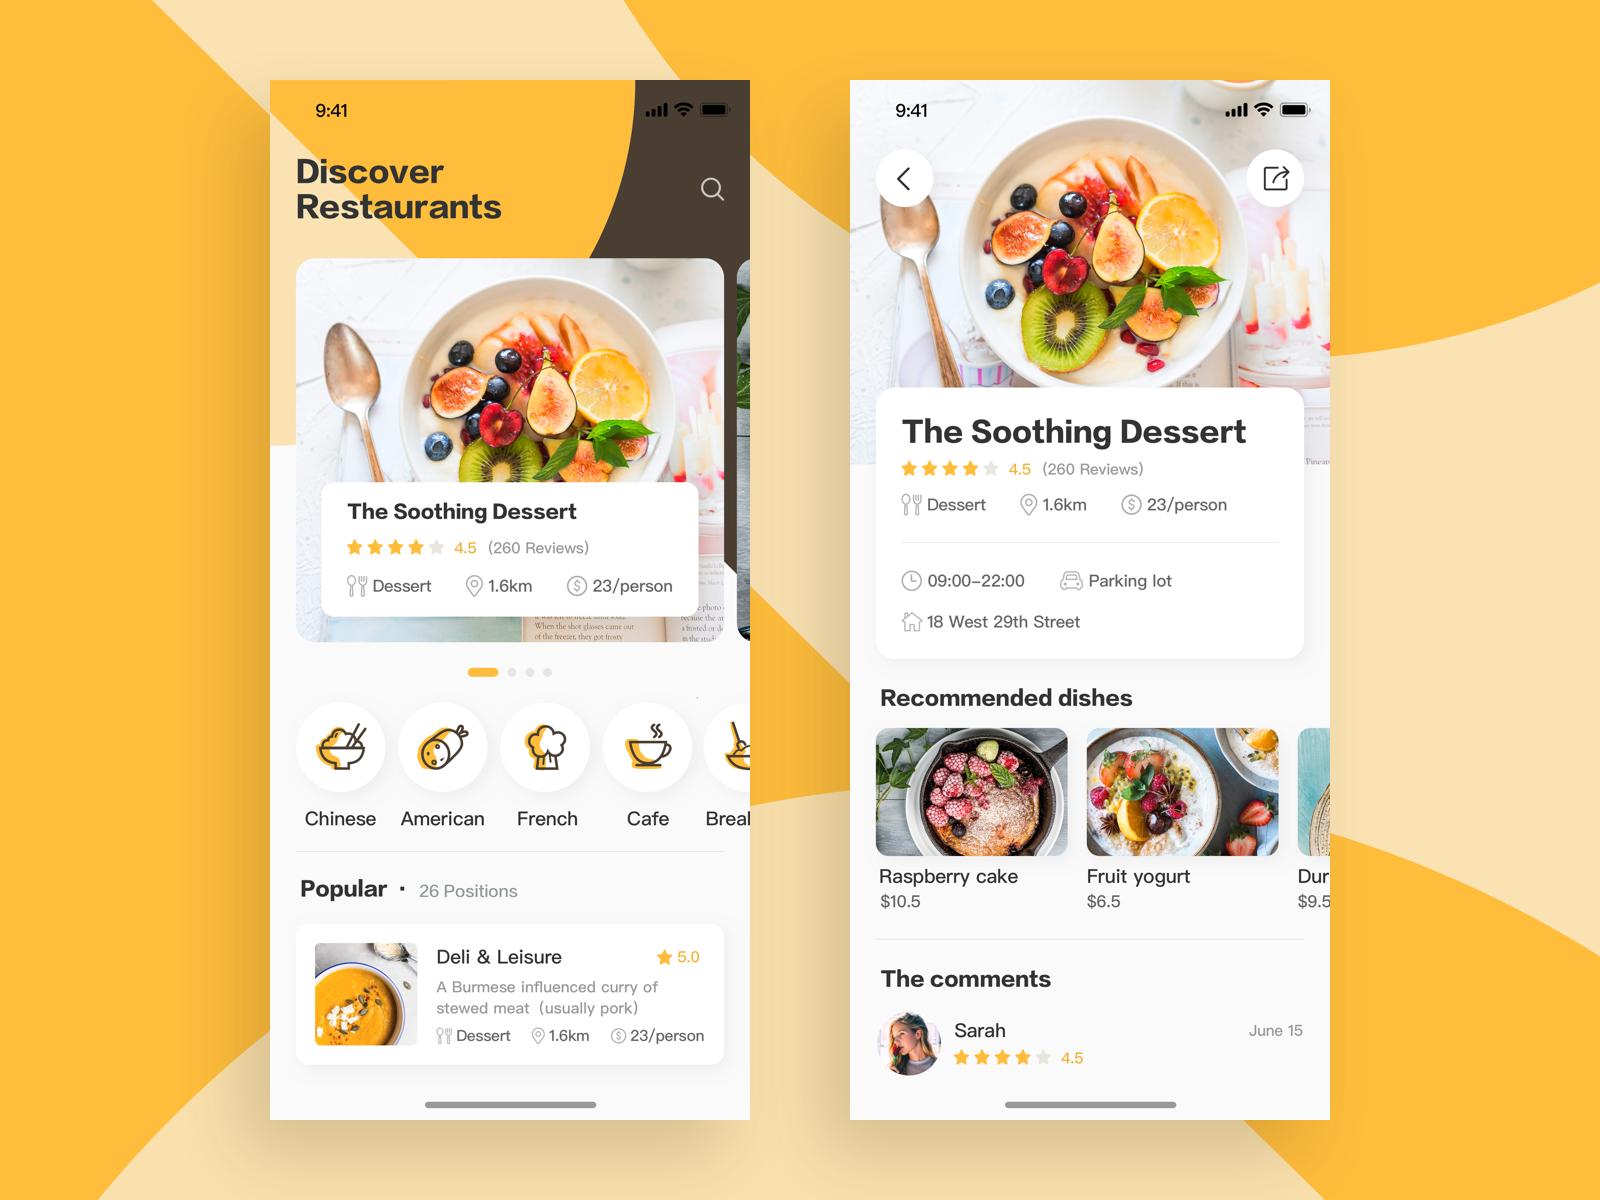 Discover restaurants 1x